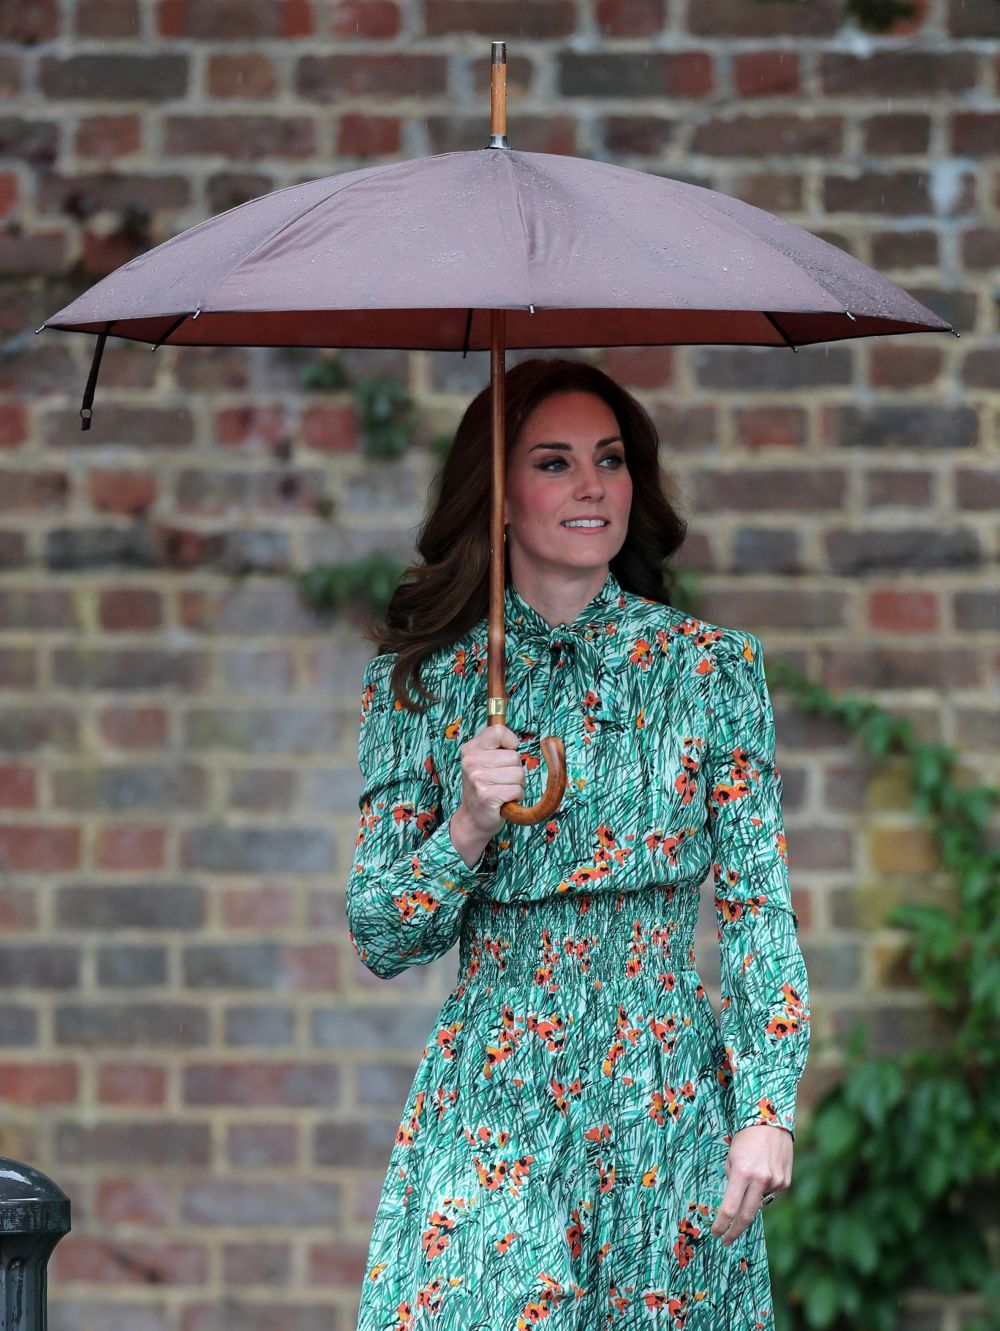 Kate Middleton en el homenaje a Diana de Gales.